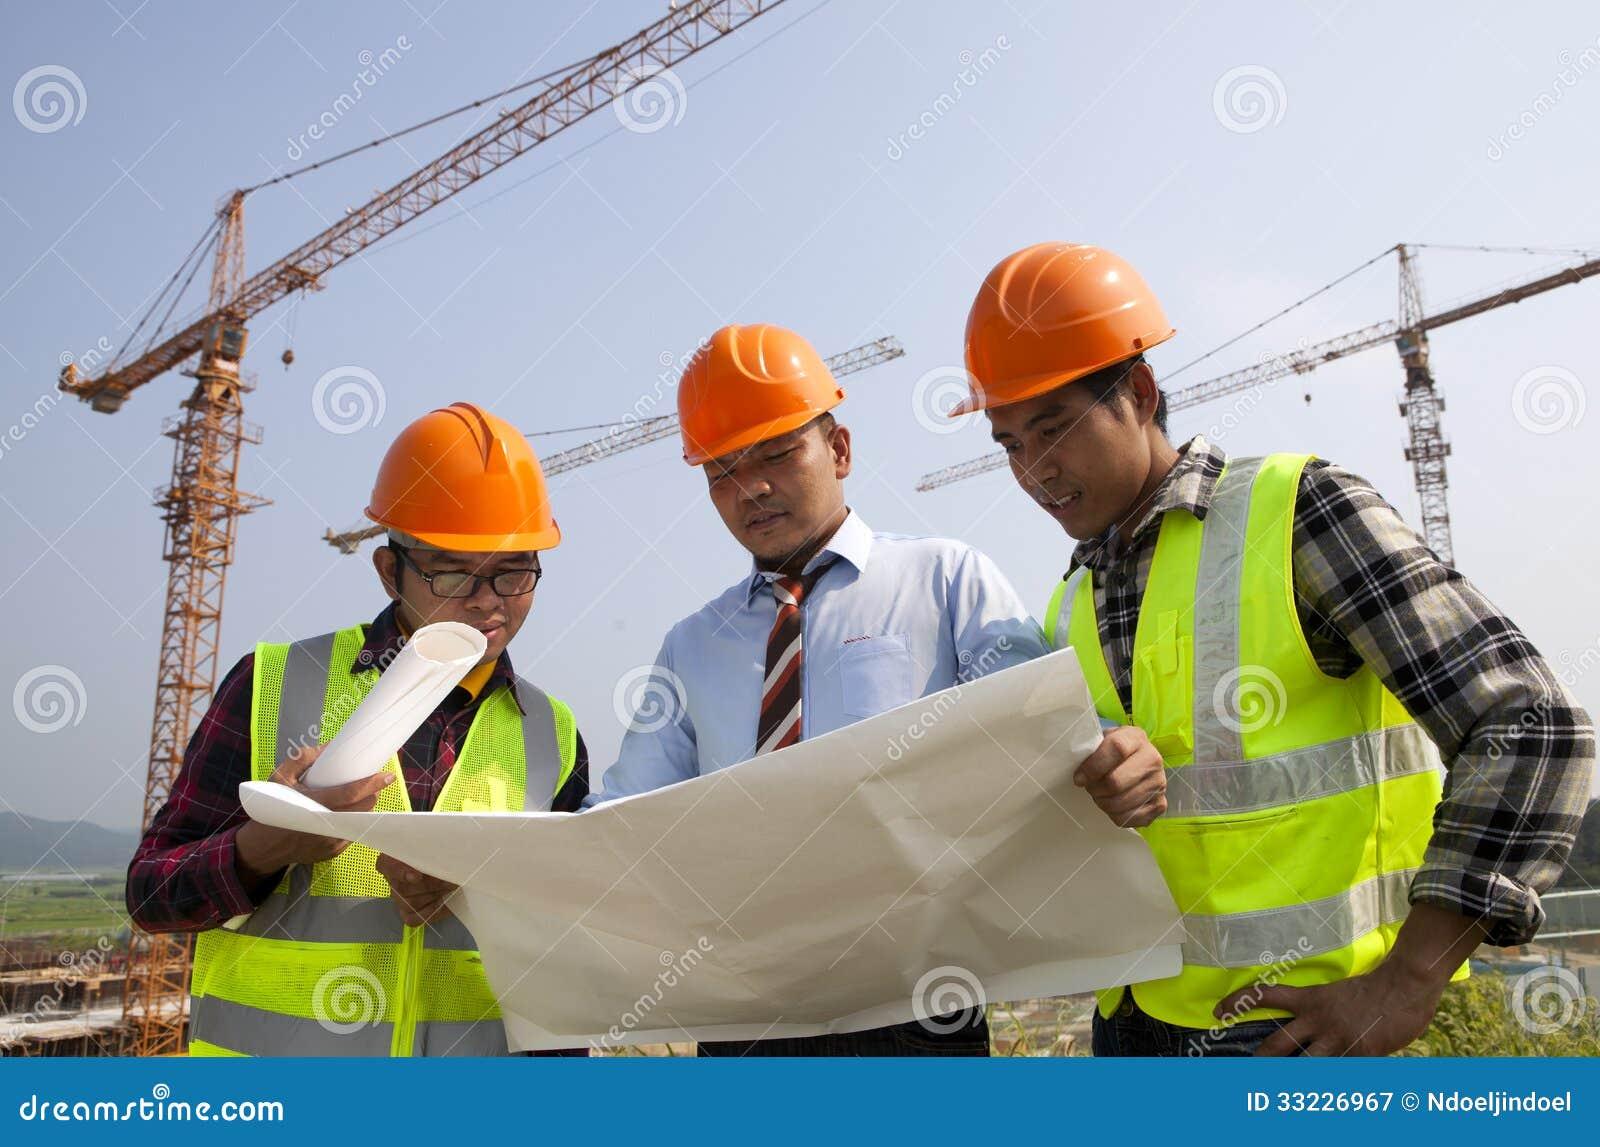 construction teamwork royalty free stock photography image 33226967. Black Bedroom Furniture Sets. Home Design Ideas